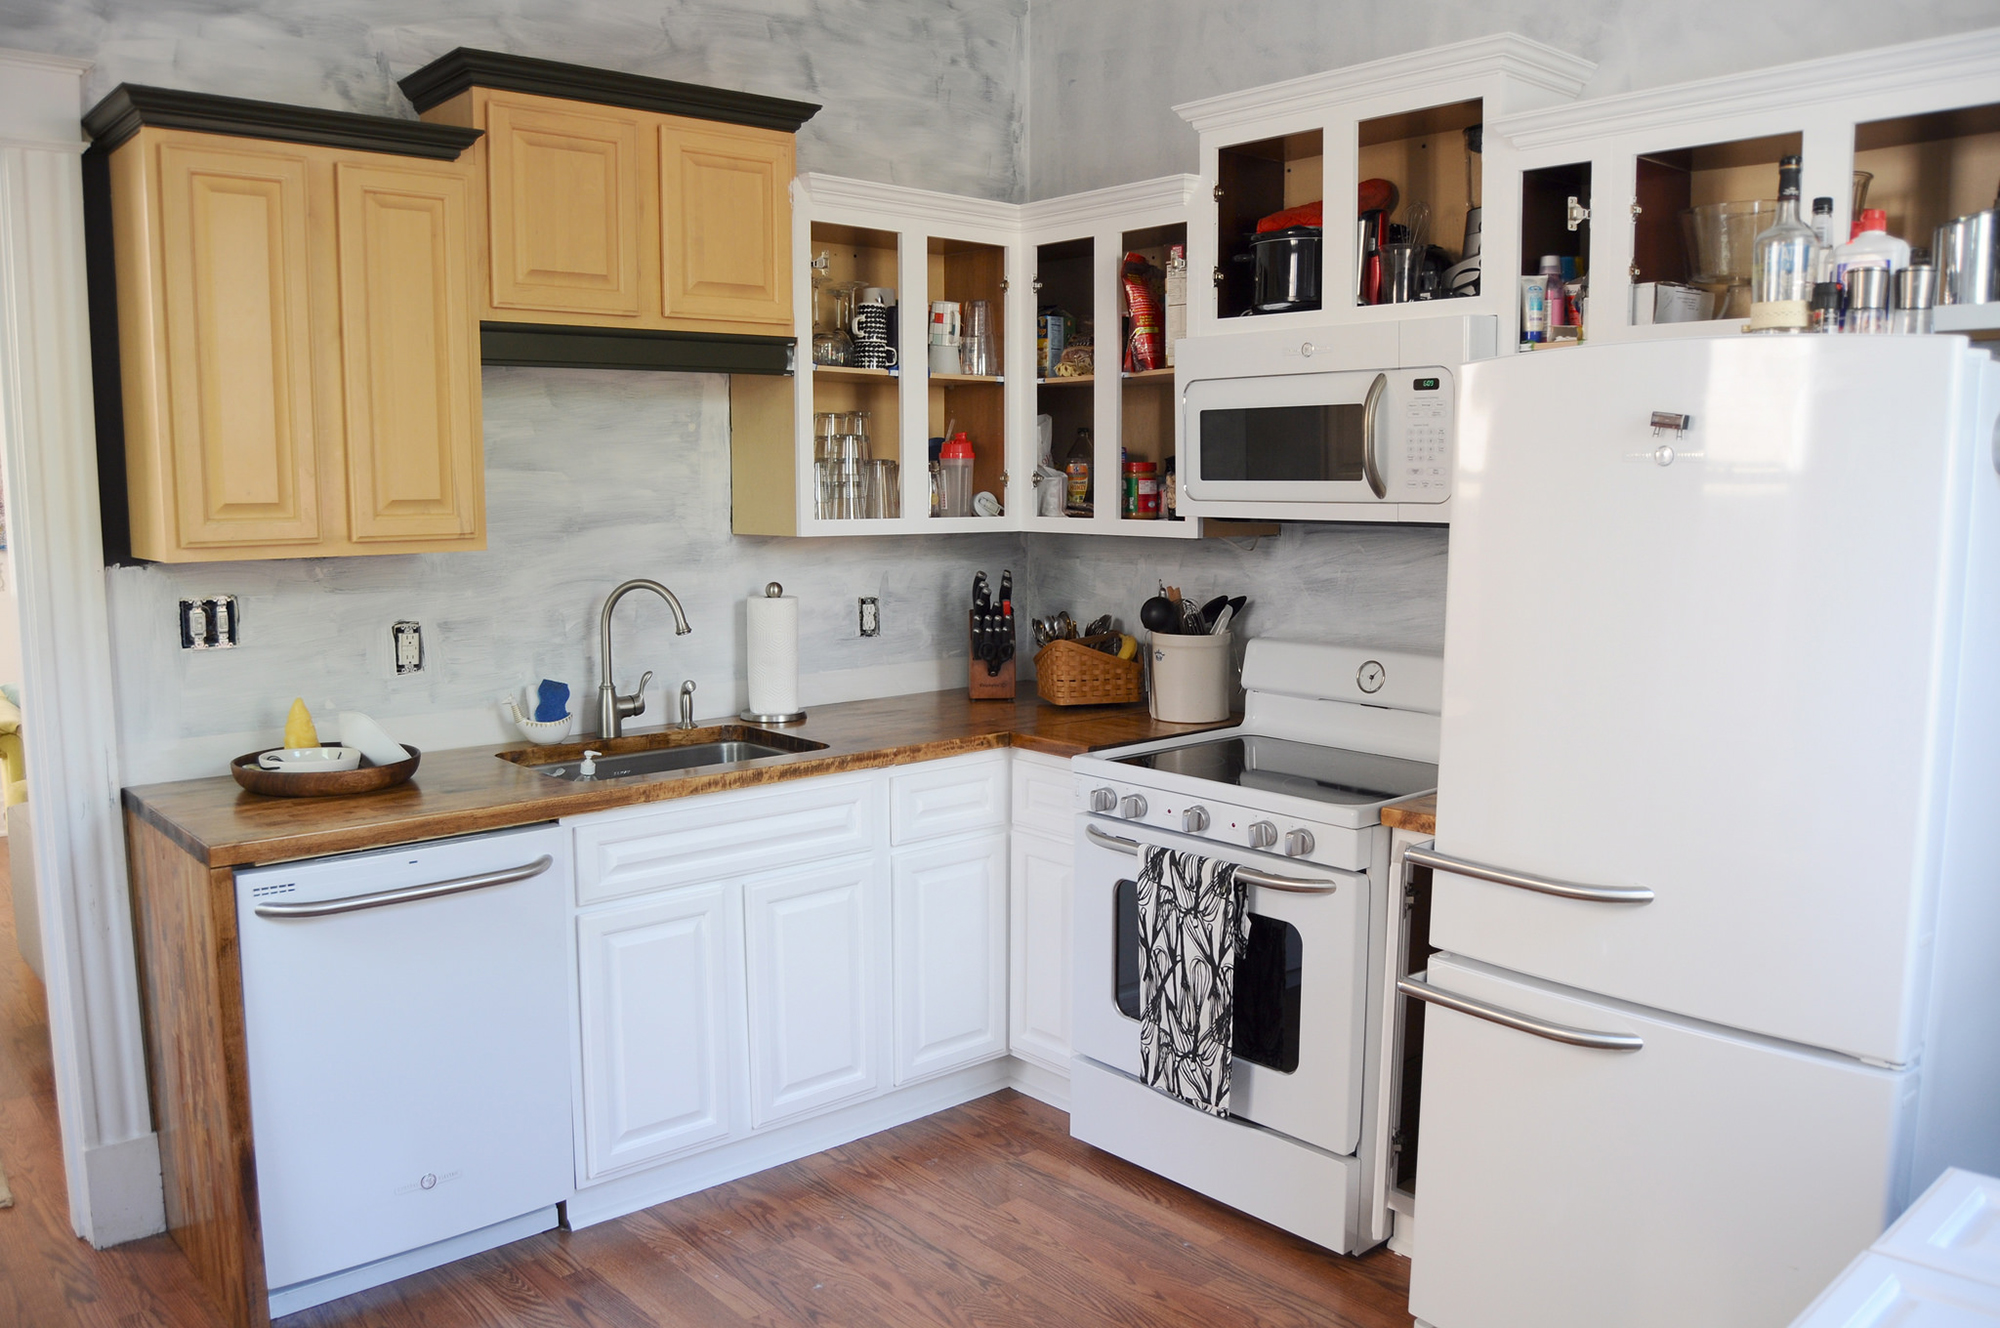 Столешница на кухне из ореха